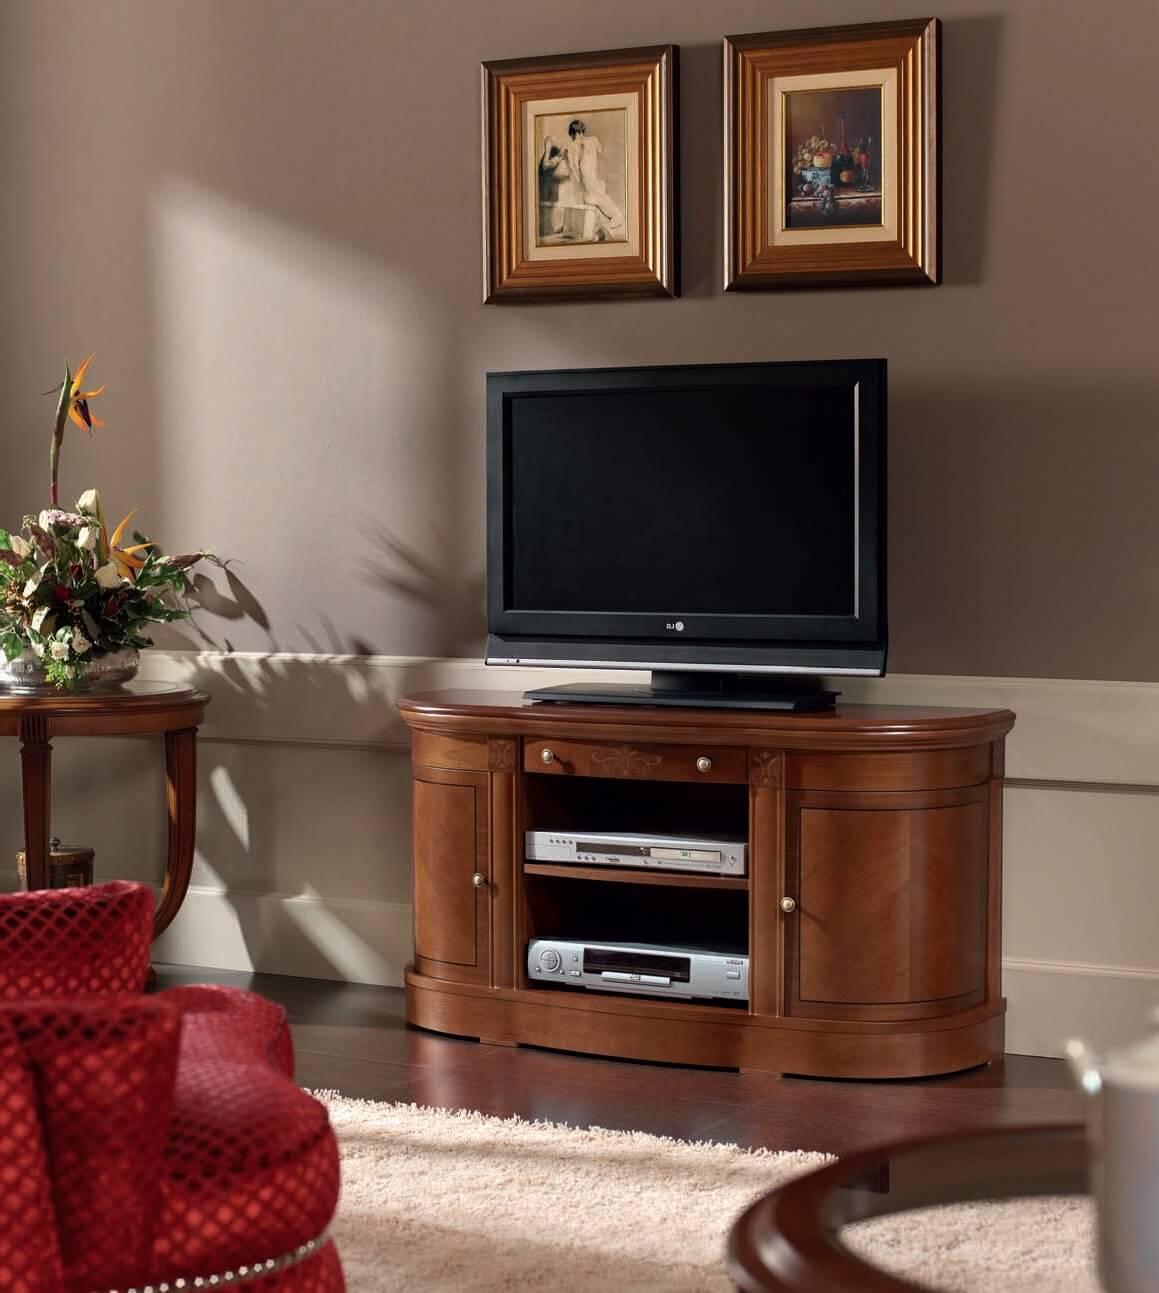 komod-pod-televizor (1)